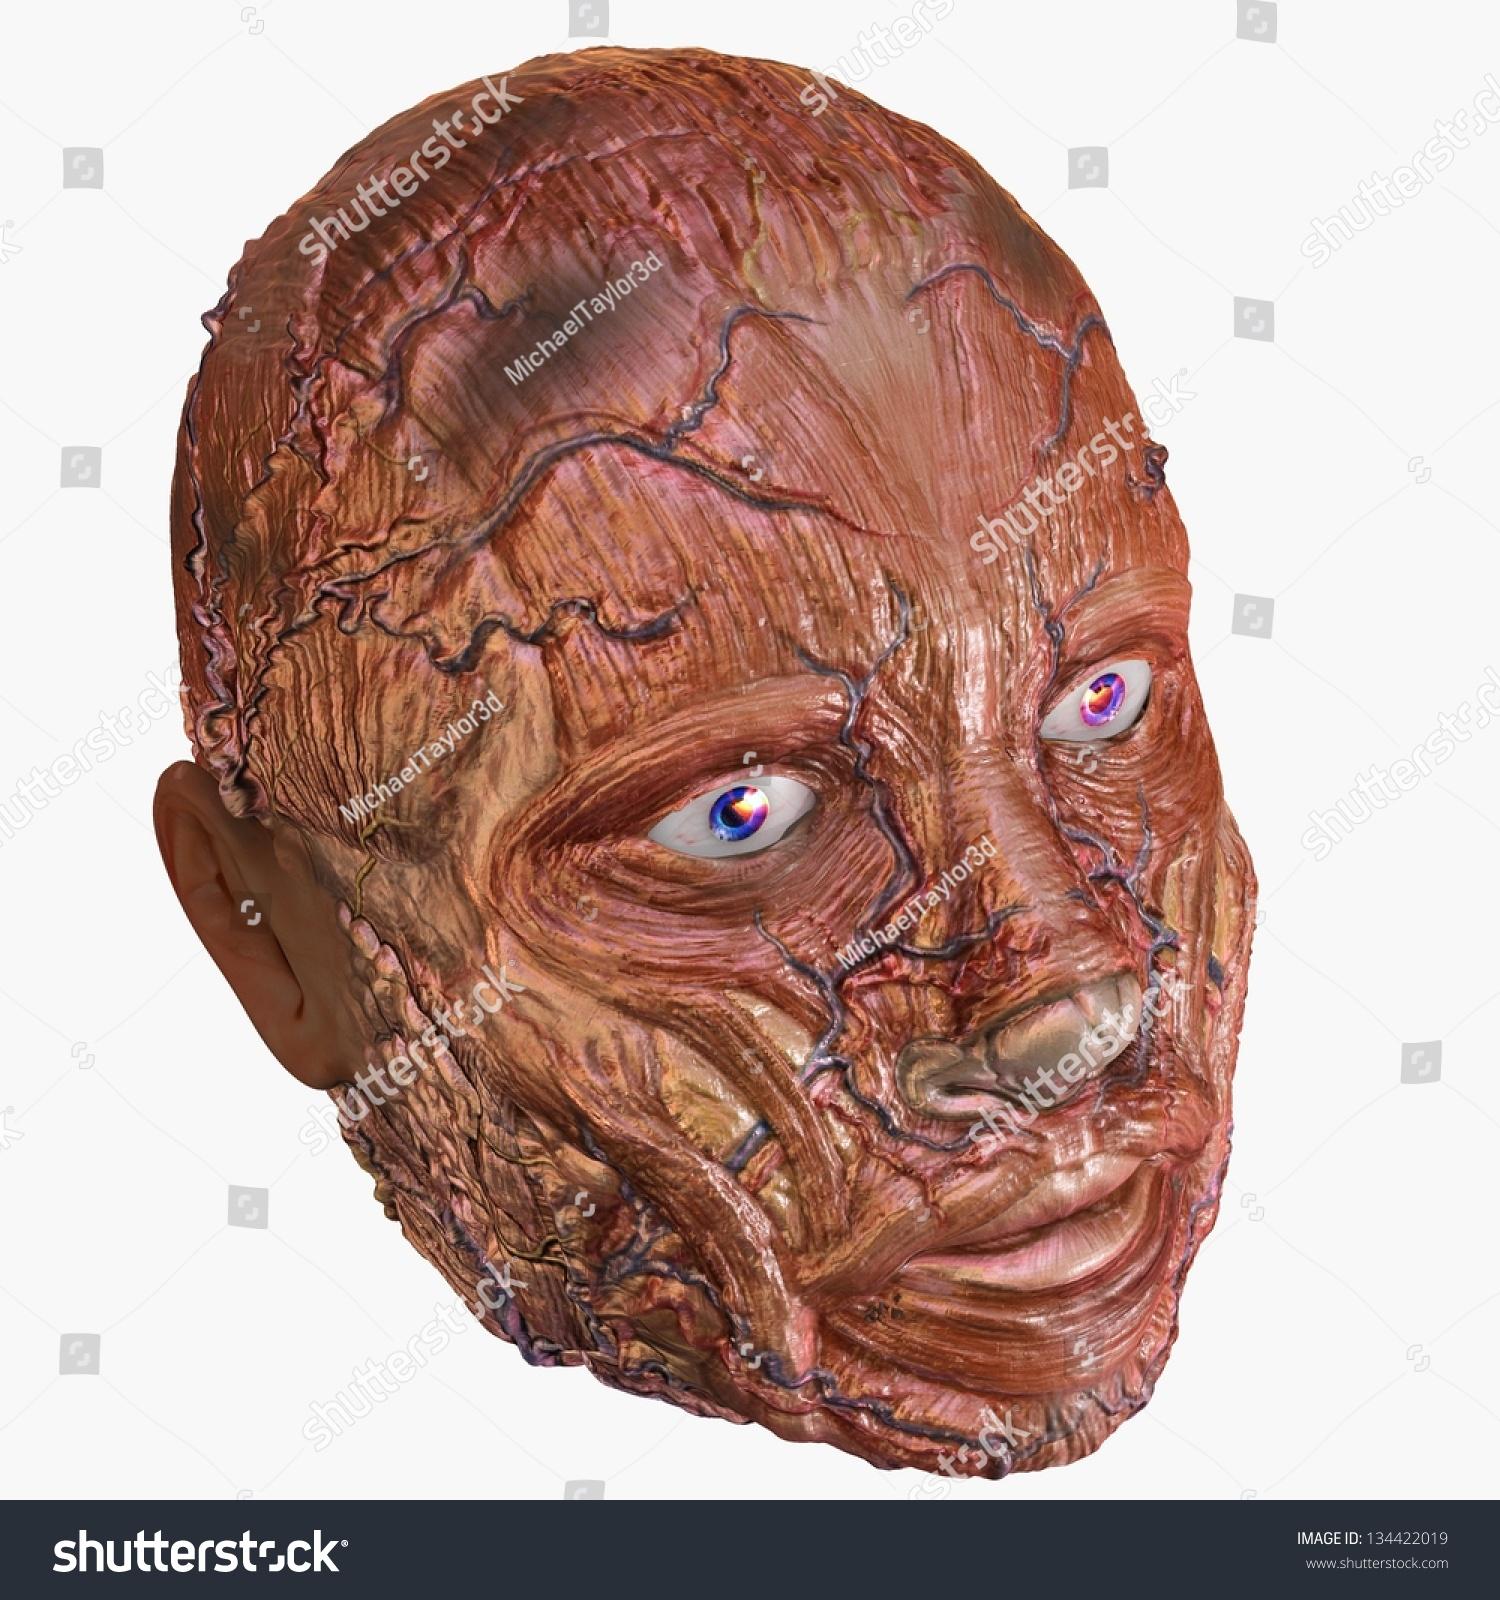 Royalty Free Stock Illustration Of Human Head Muscle Anatomy Stock